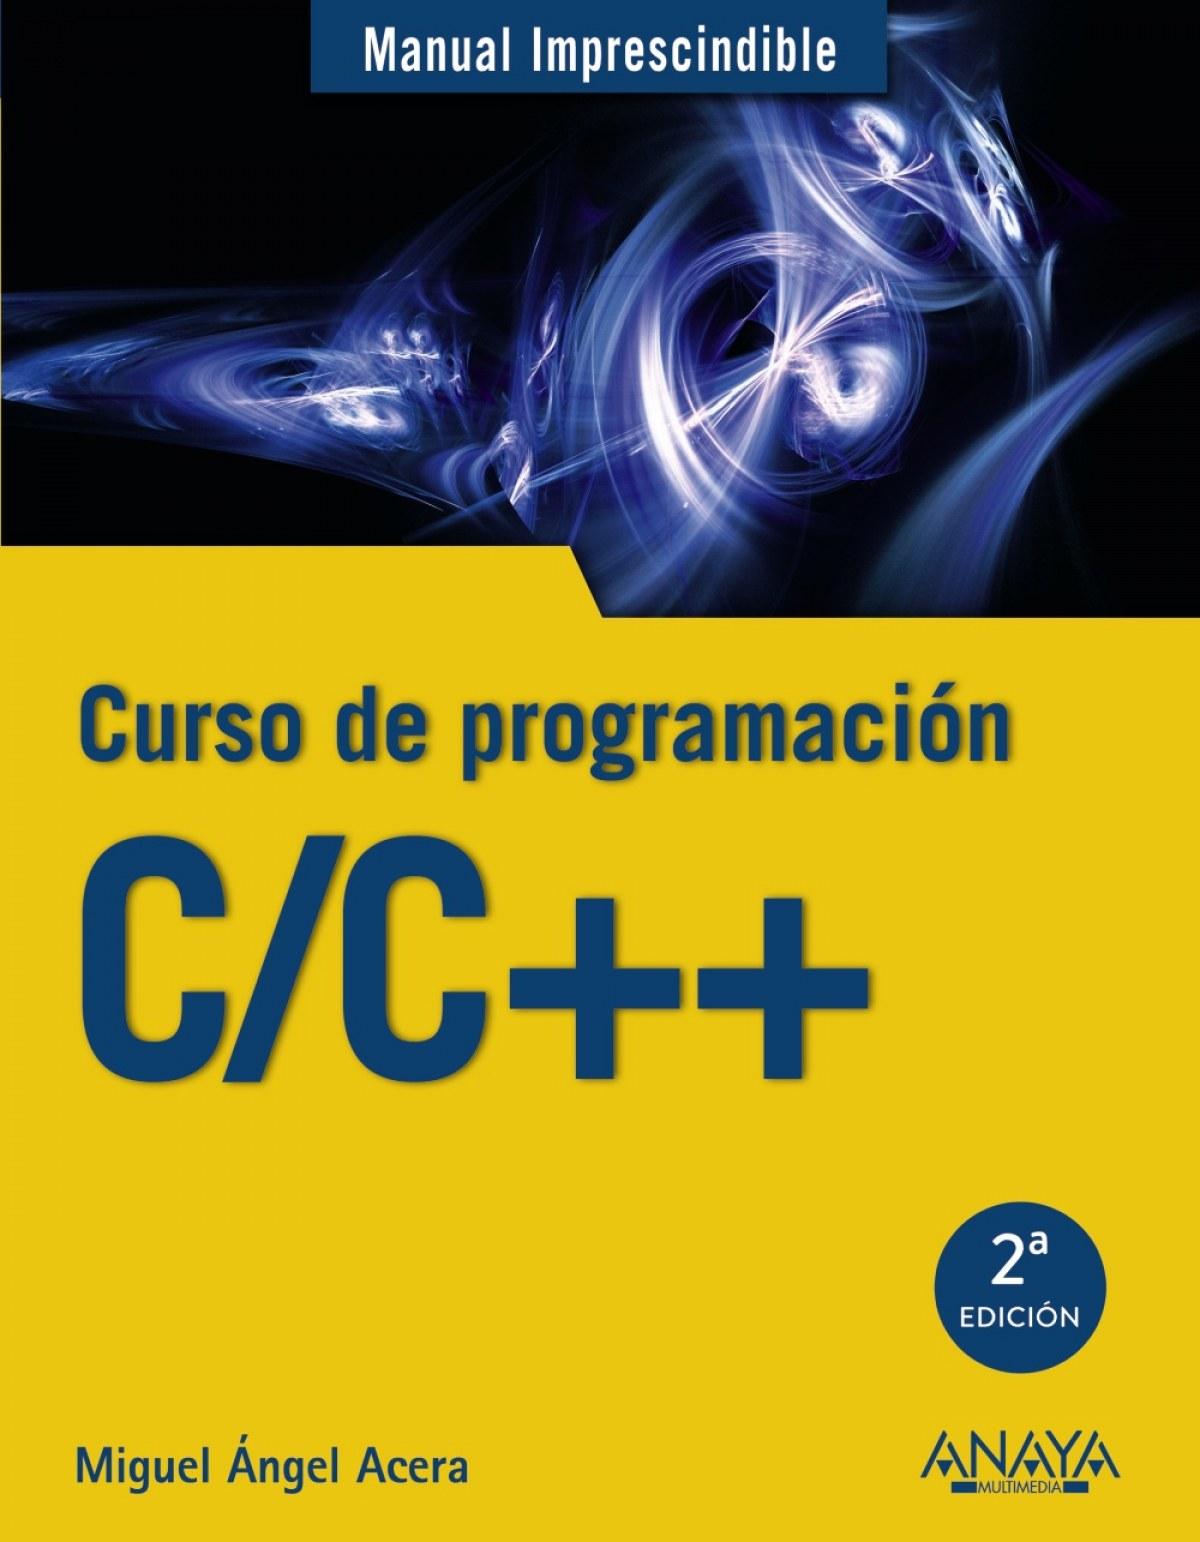 C/C++ CURSO DE PROGRAMACIÓN 9788441539372